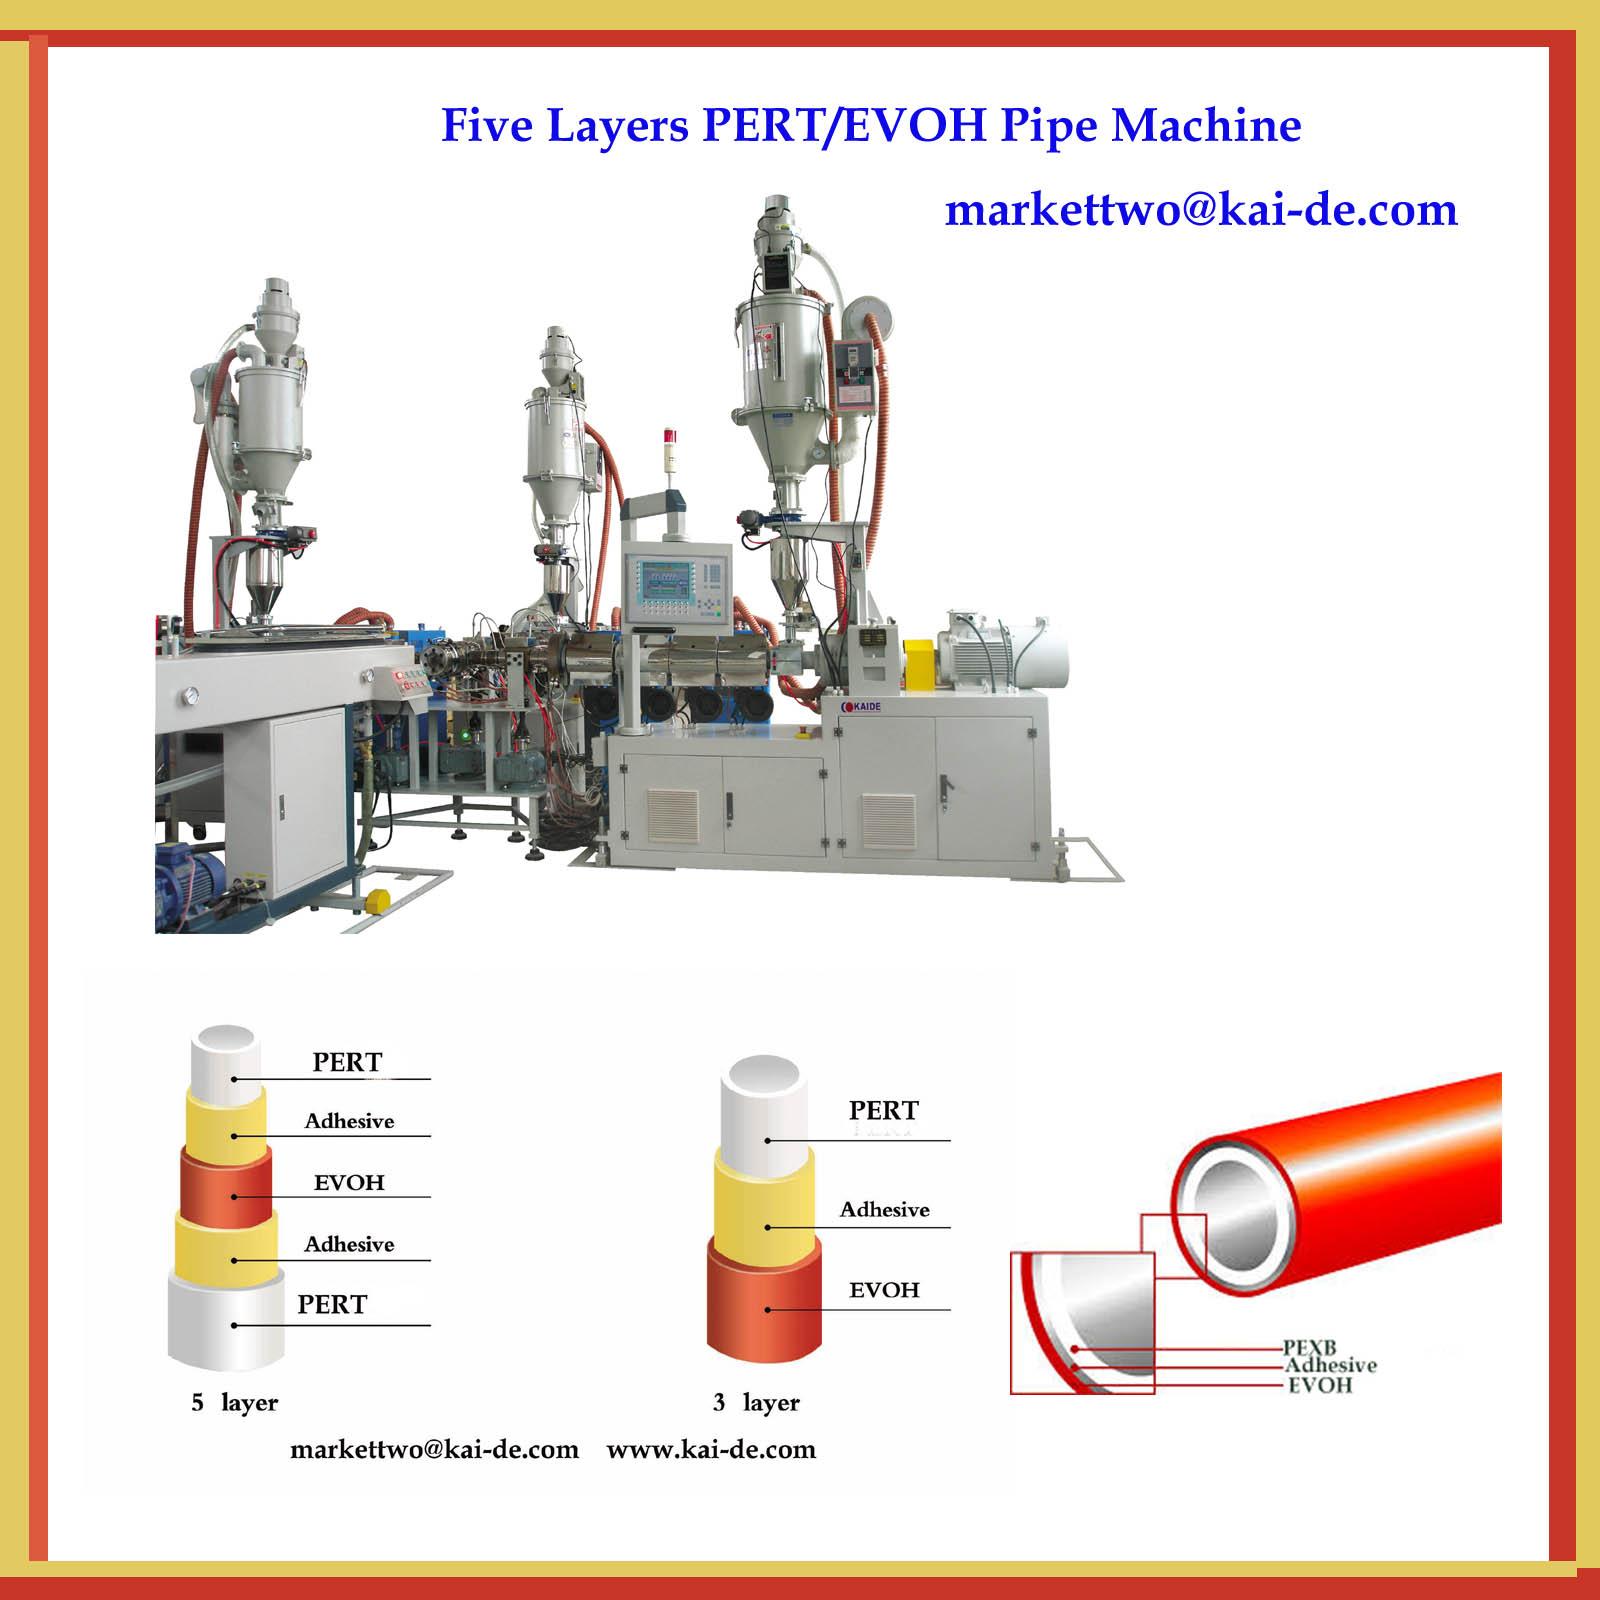 PEXB-EVOH Pipe Production Line(Whatsapp:886-13705369780)